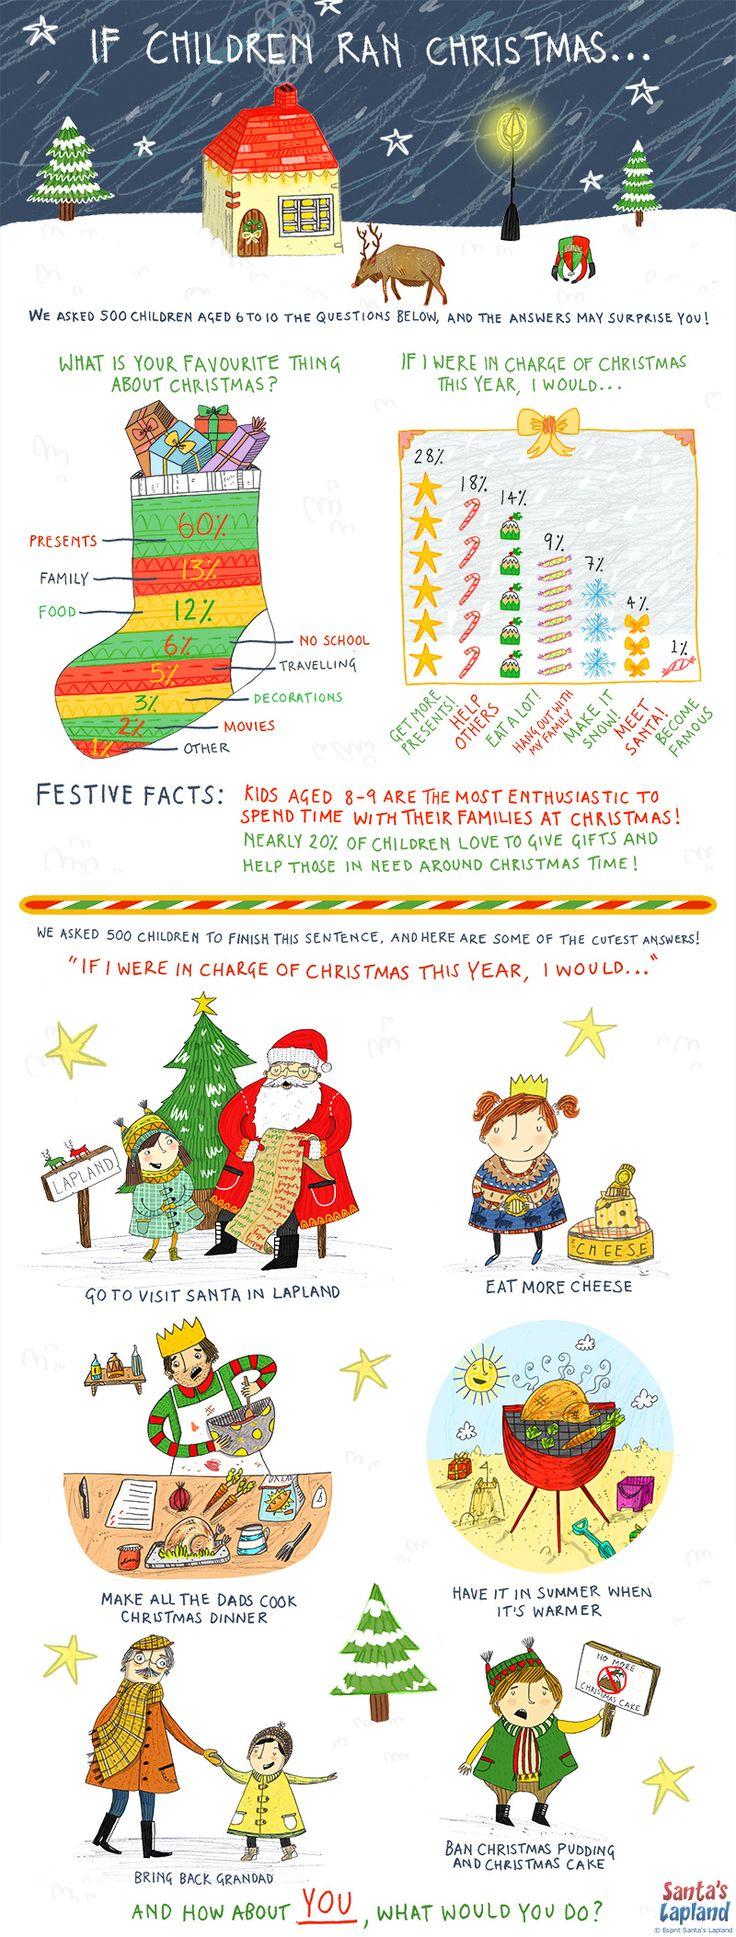 Santa's Lapland - If Children Ran Christmas